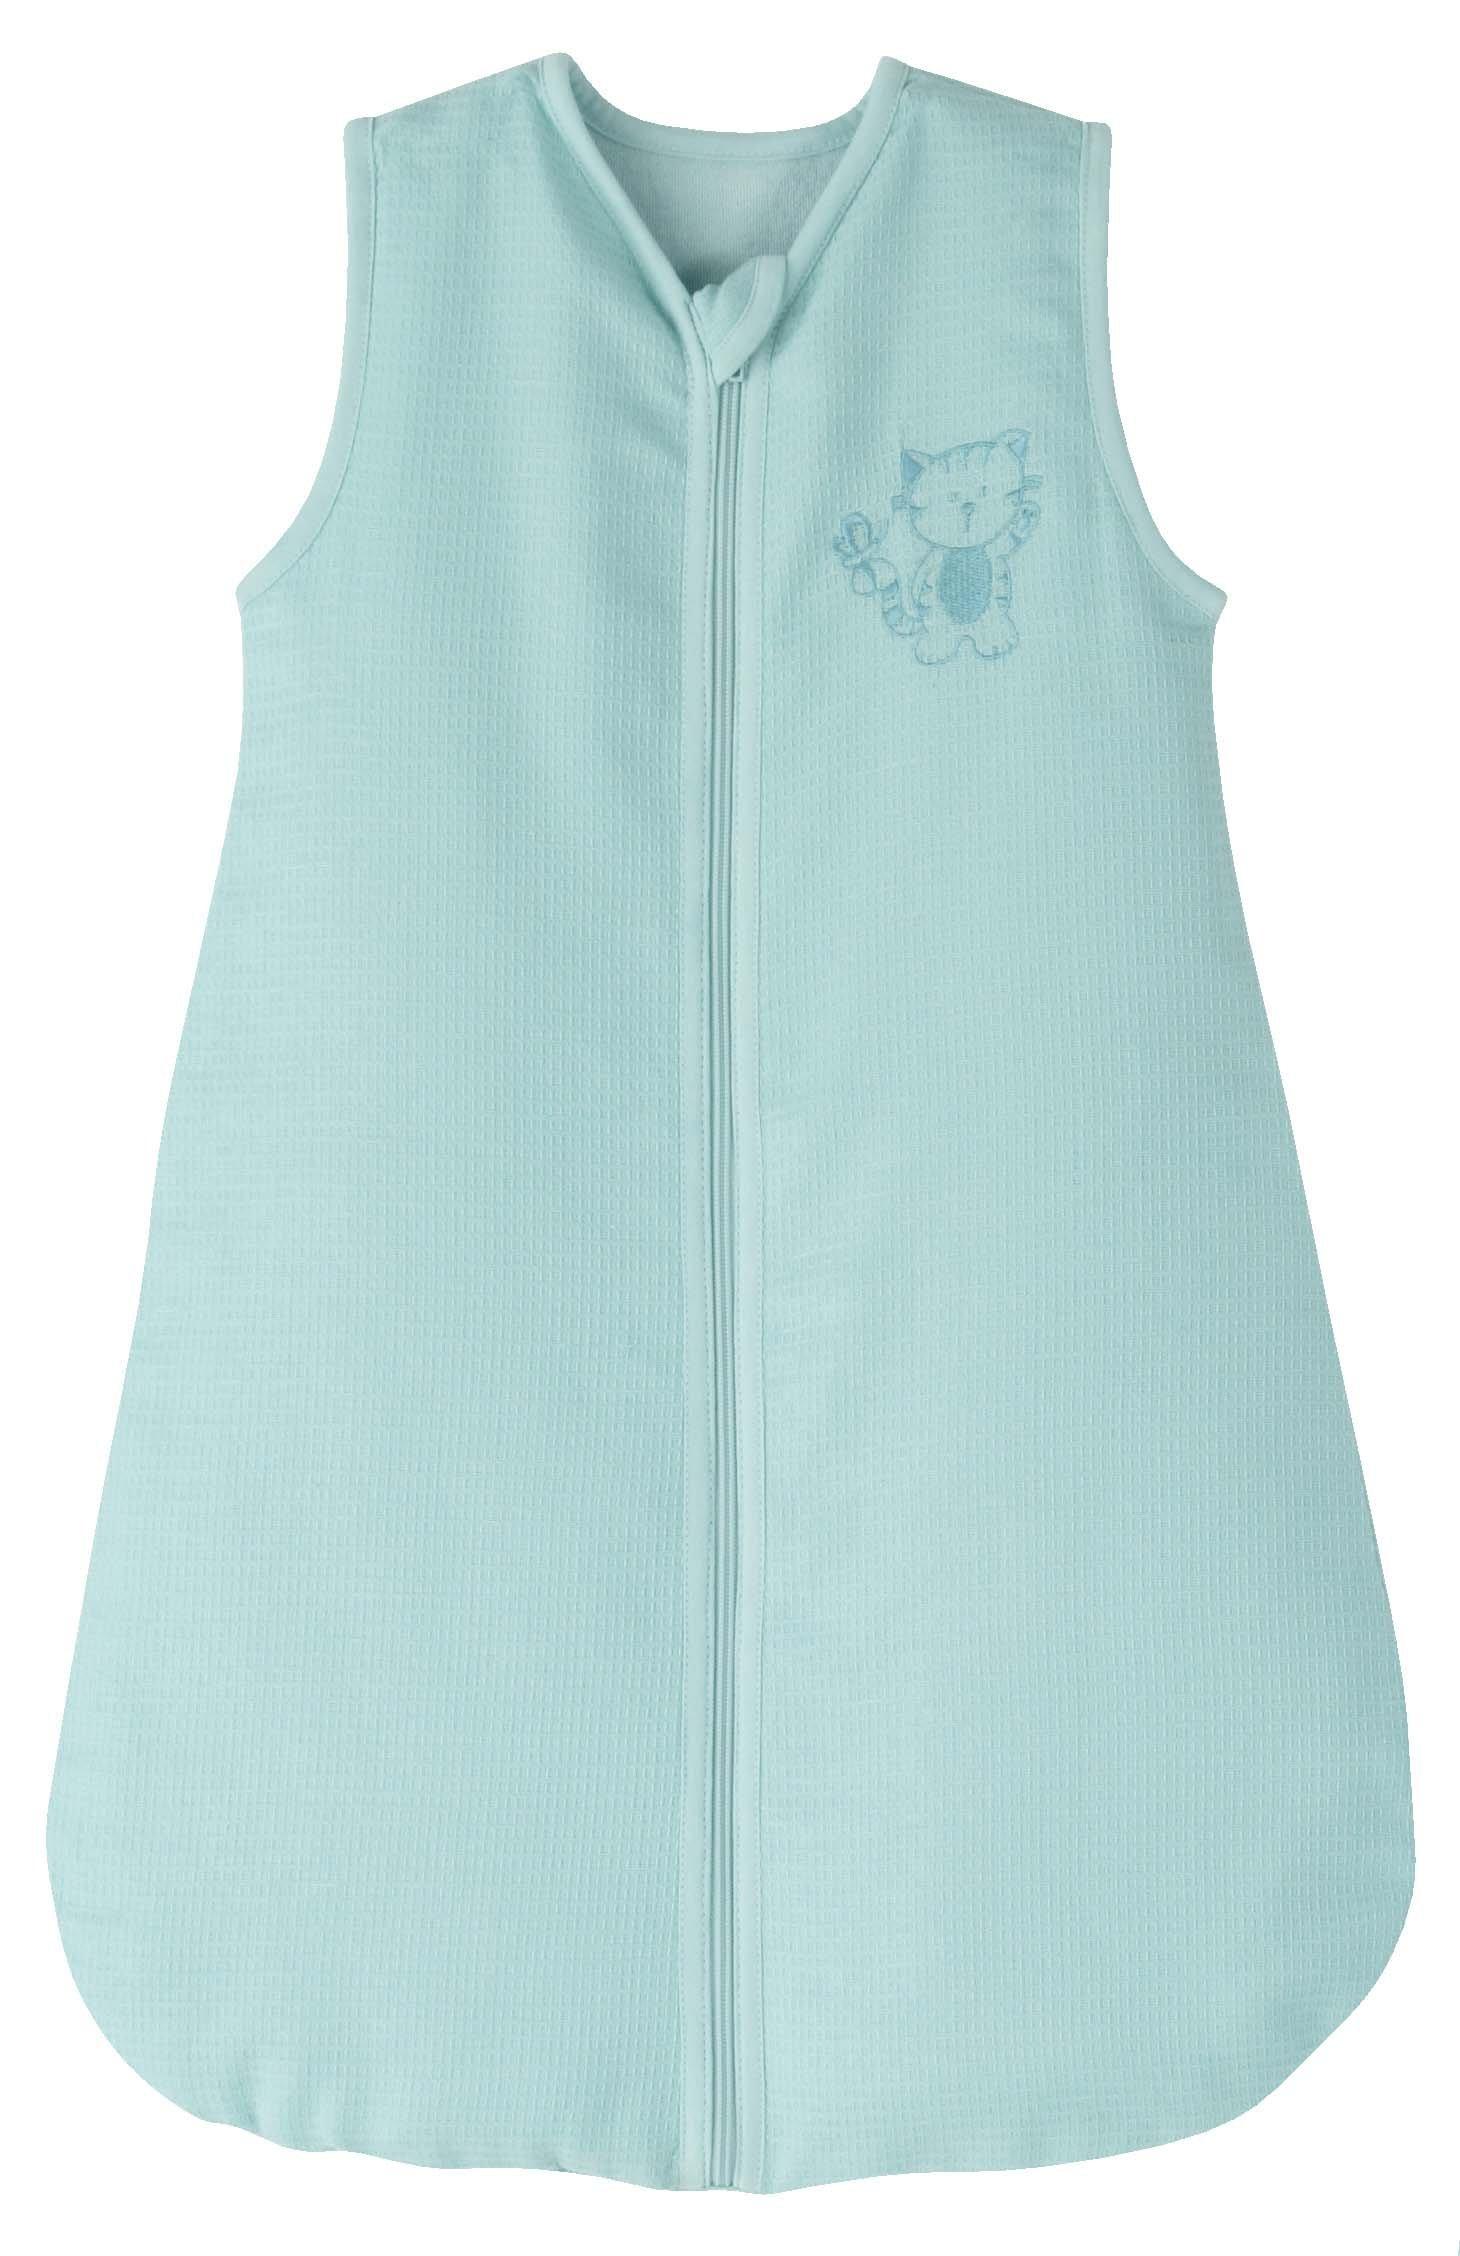 PMP-Saco para bebé de verano, color azul, 65 cm, diseño de bebé de 0 a 6 meses